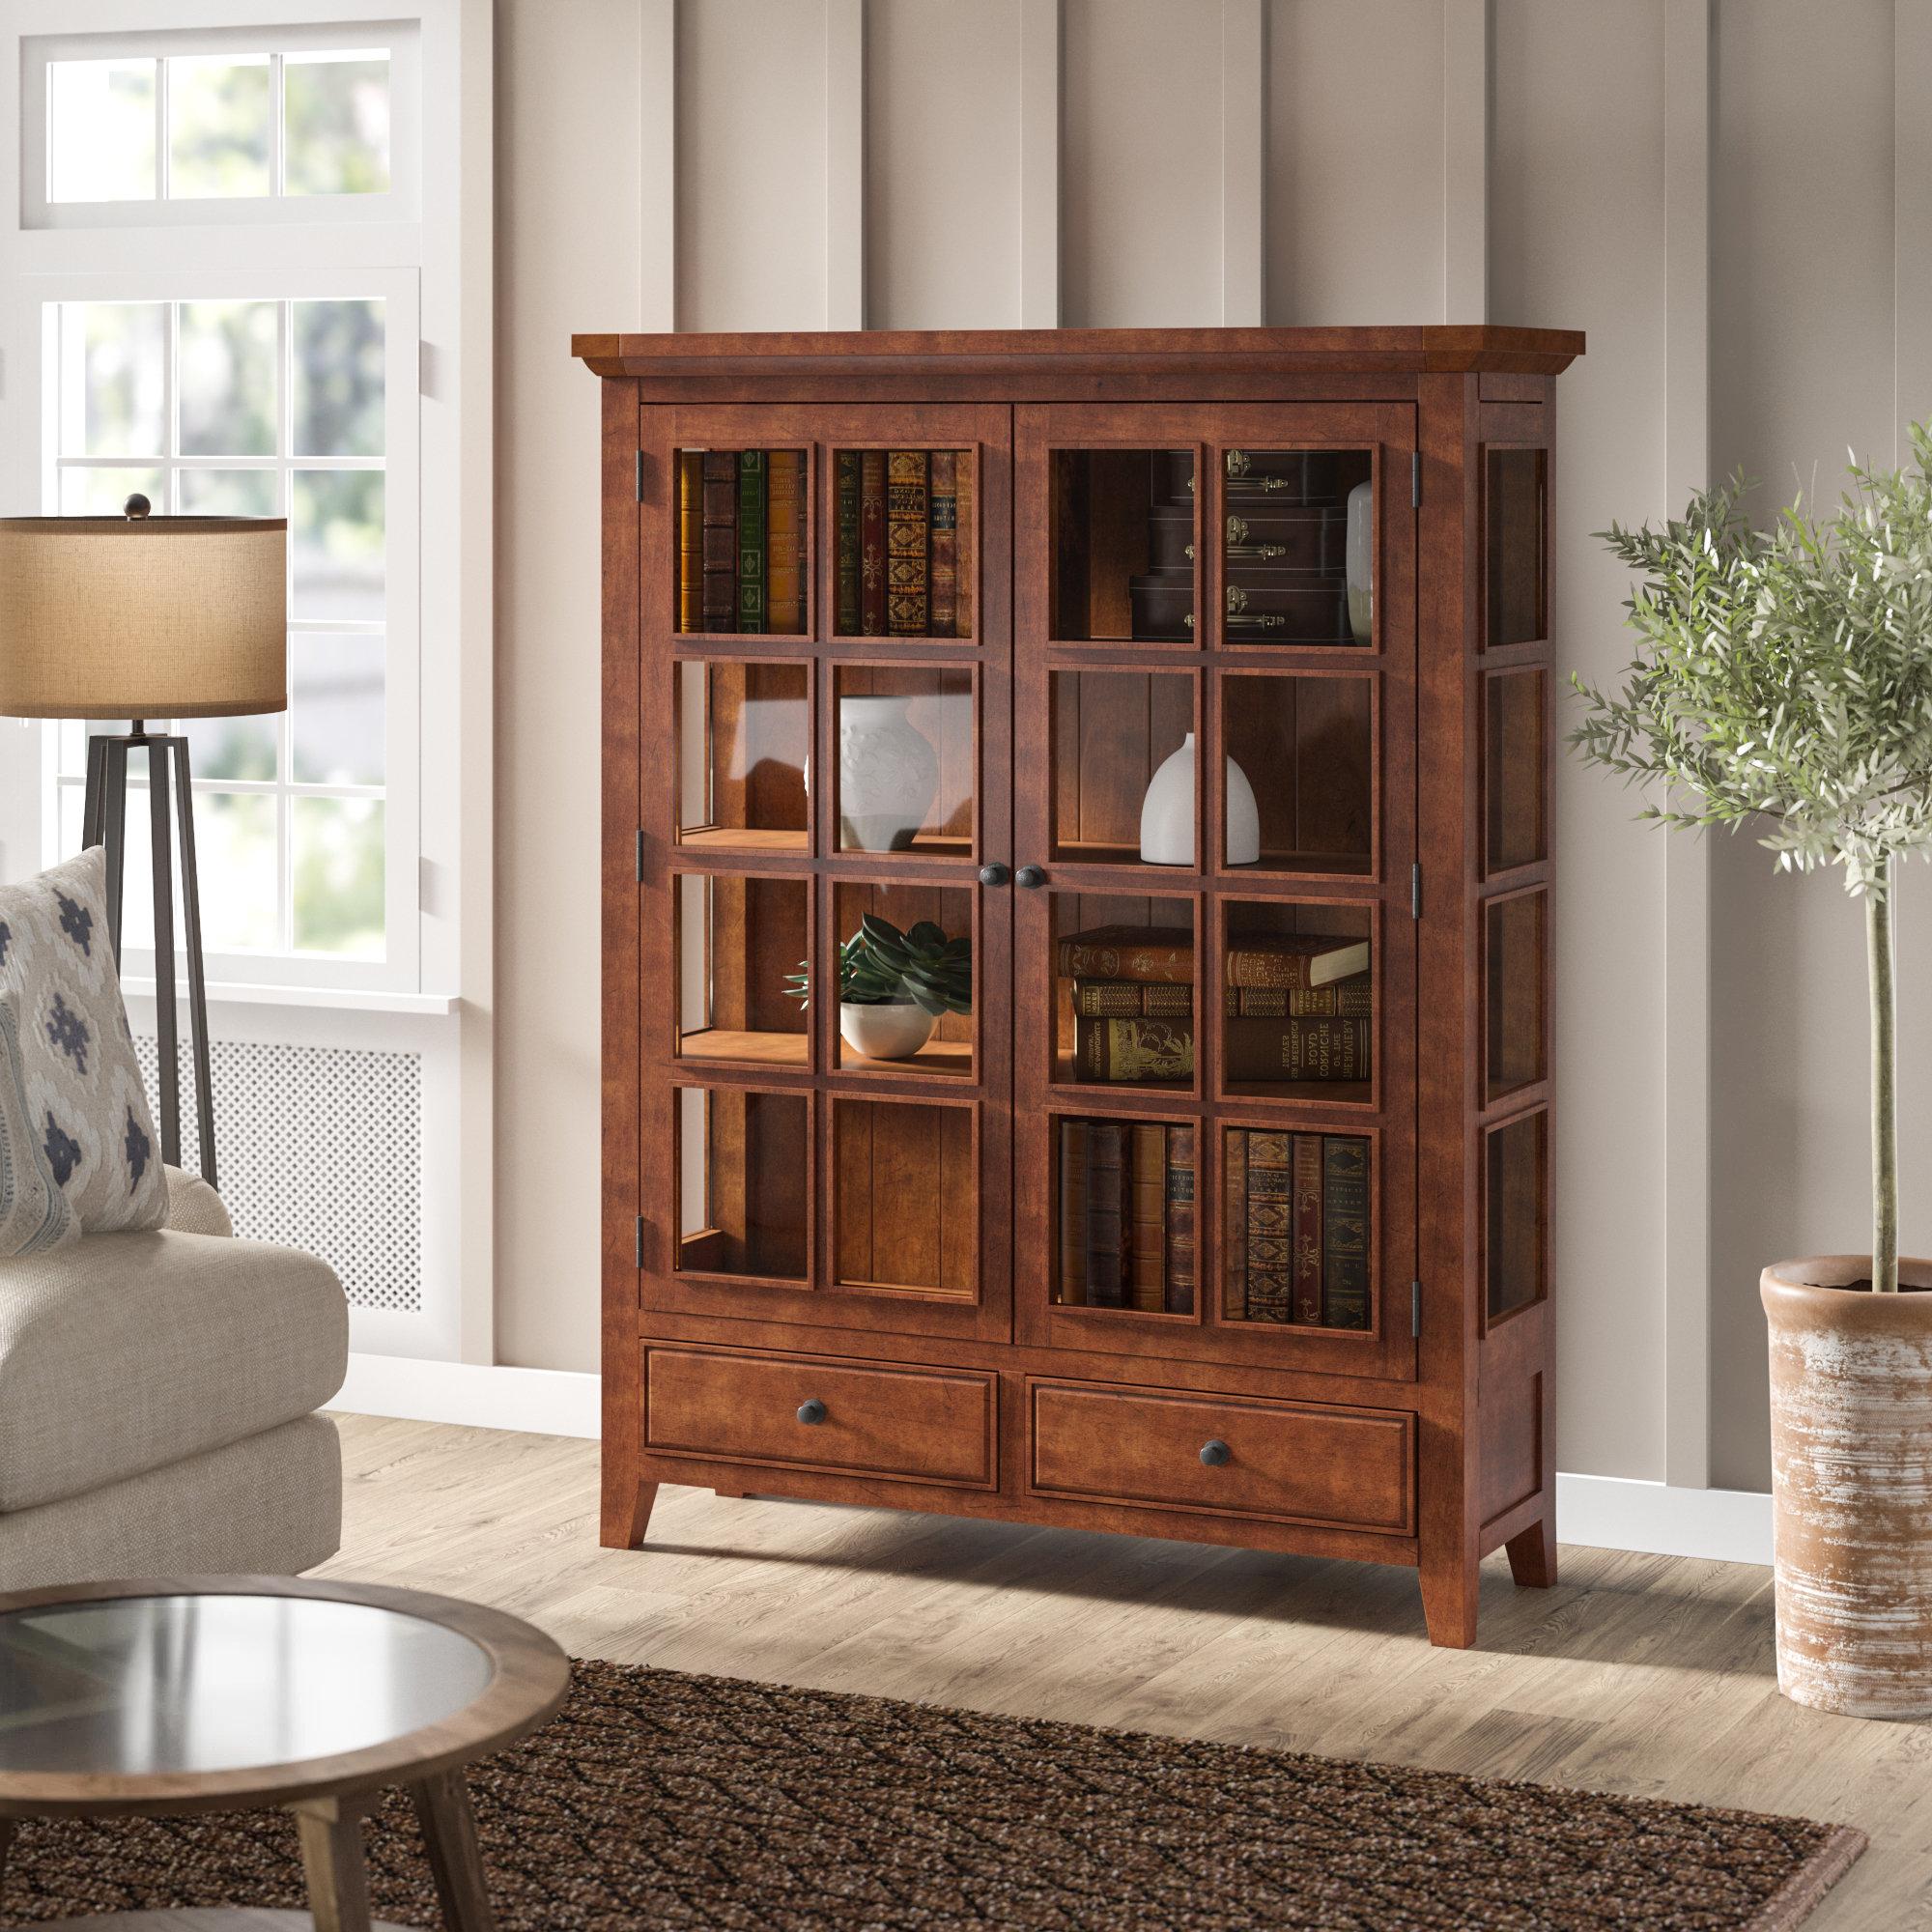 2019 Harris Standard Bookcase With Regard To Cerrato Standard Bookcases (Gallery 15 of 20)